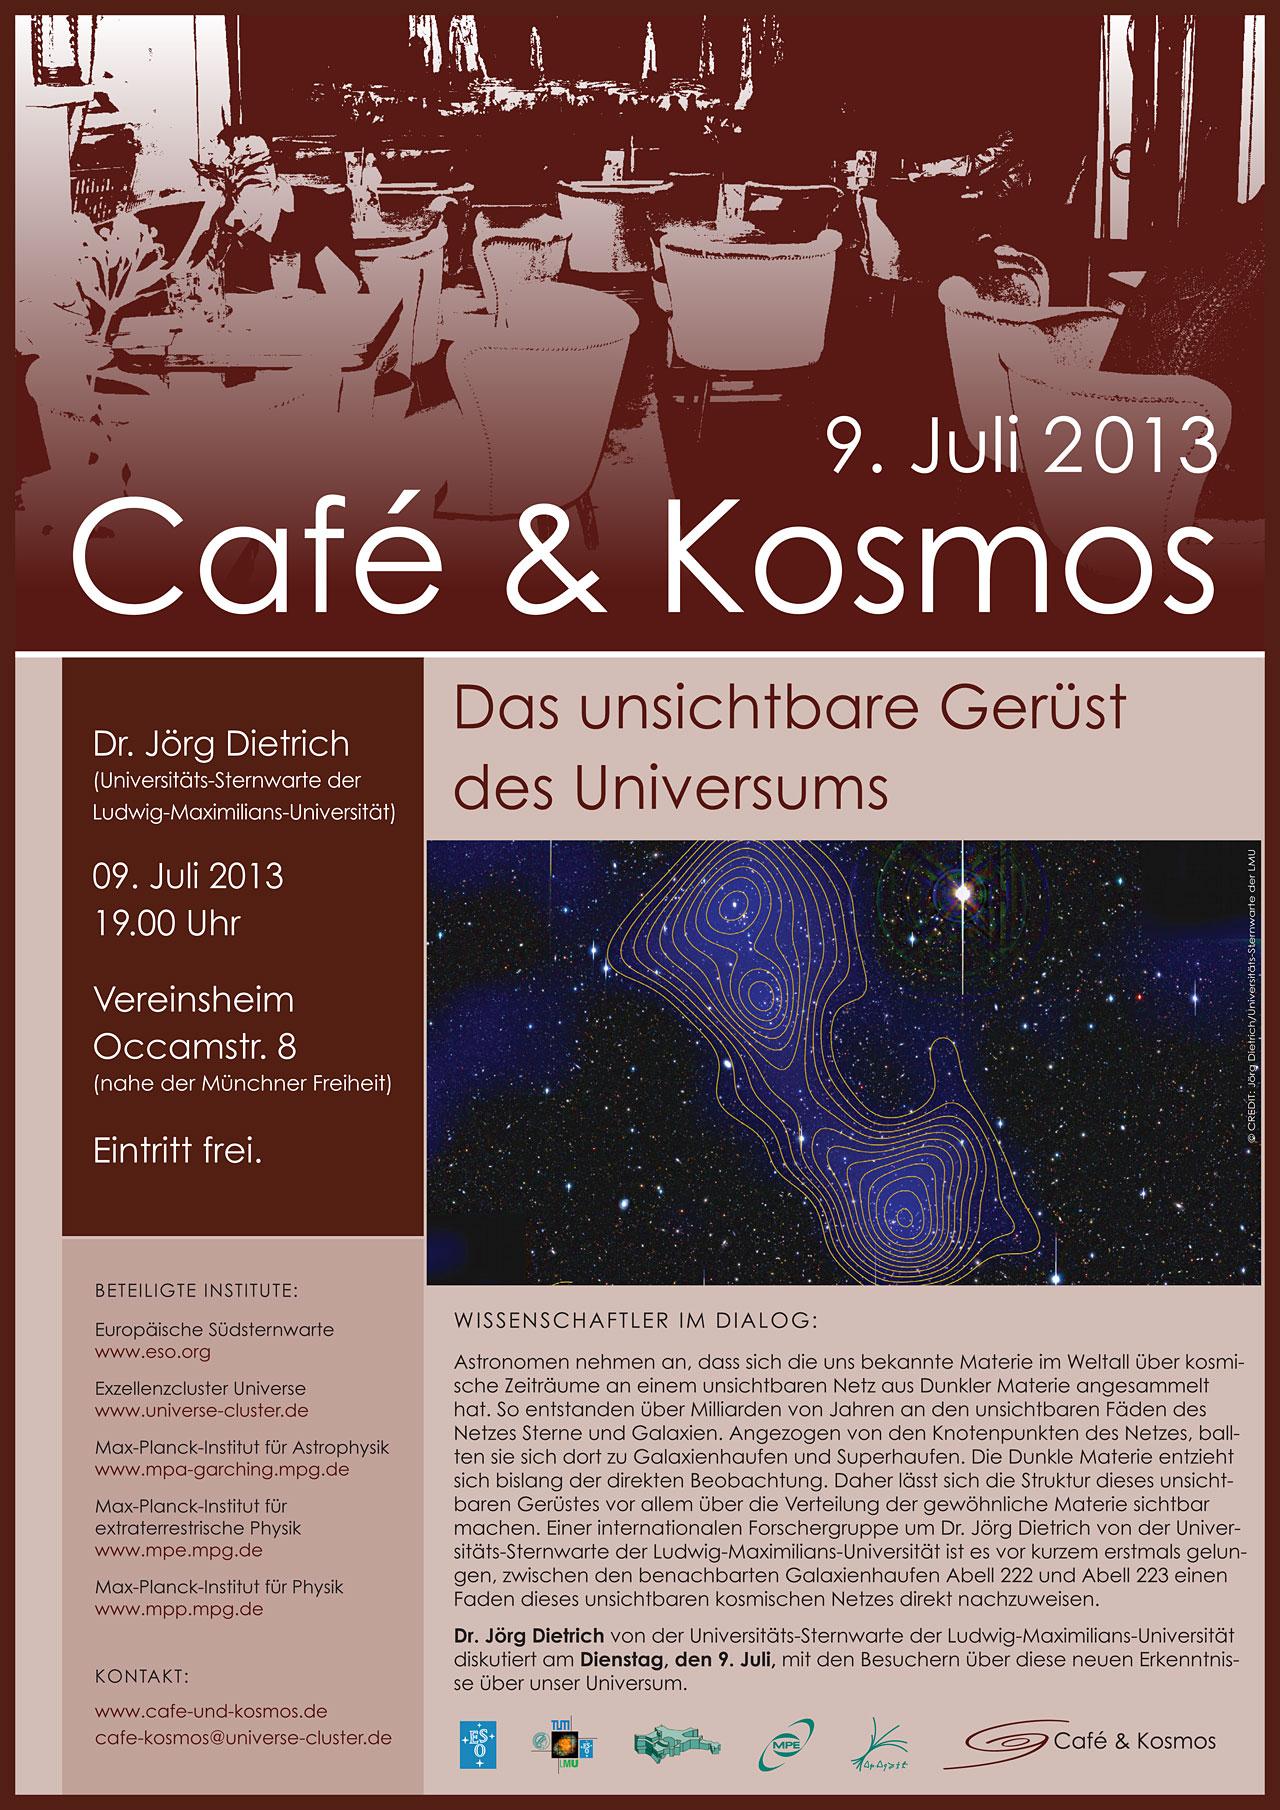 Café & Kosmos 9 July 2013